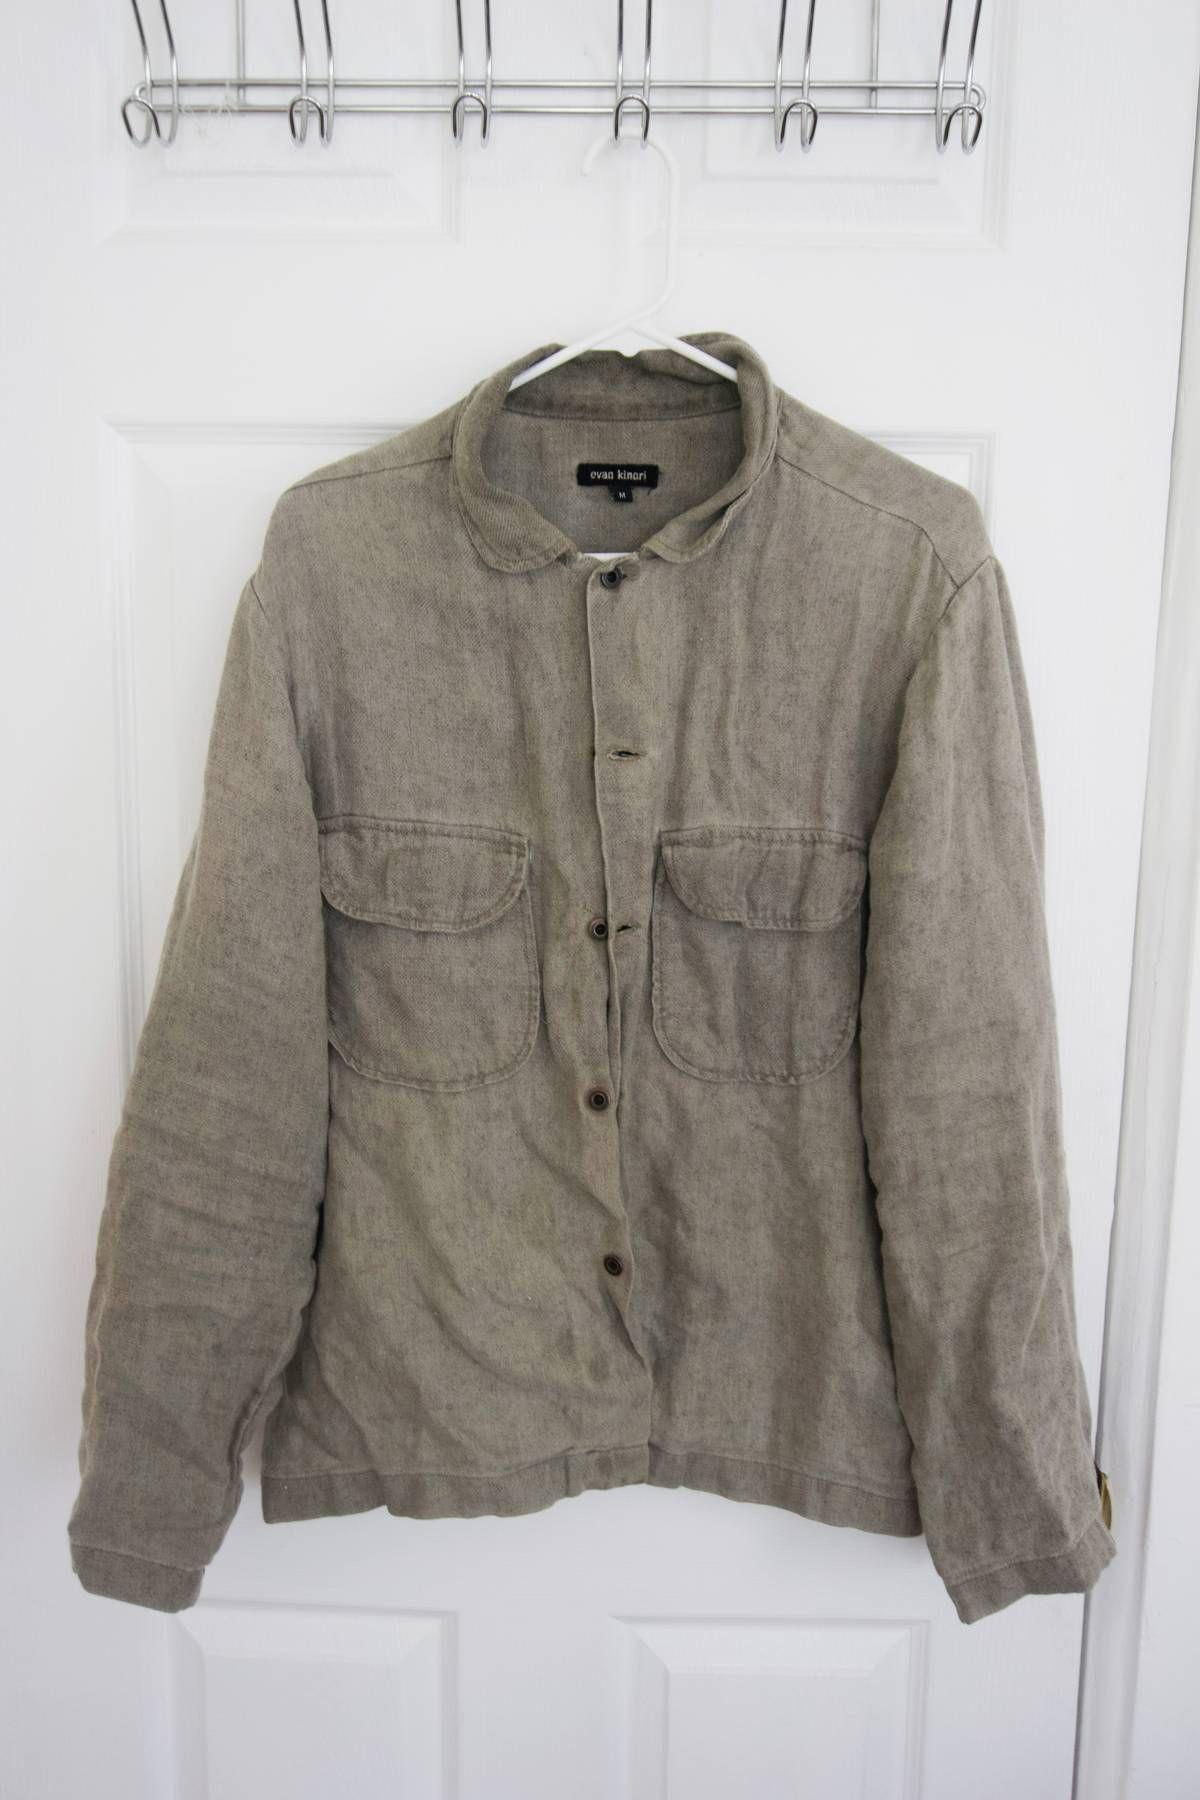 873388a0e4617 Buy Evan Kinori Linen hemp field shirt, Size: M, Description: Retail was